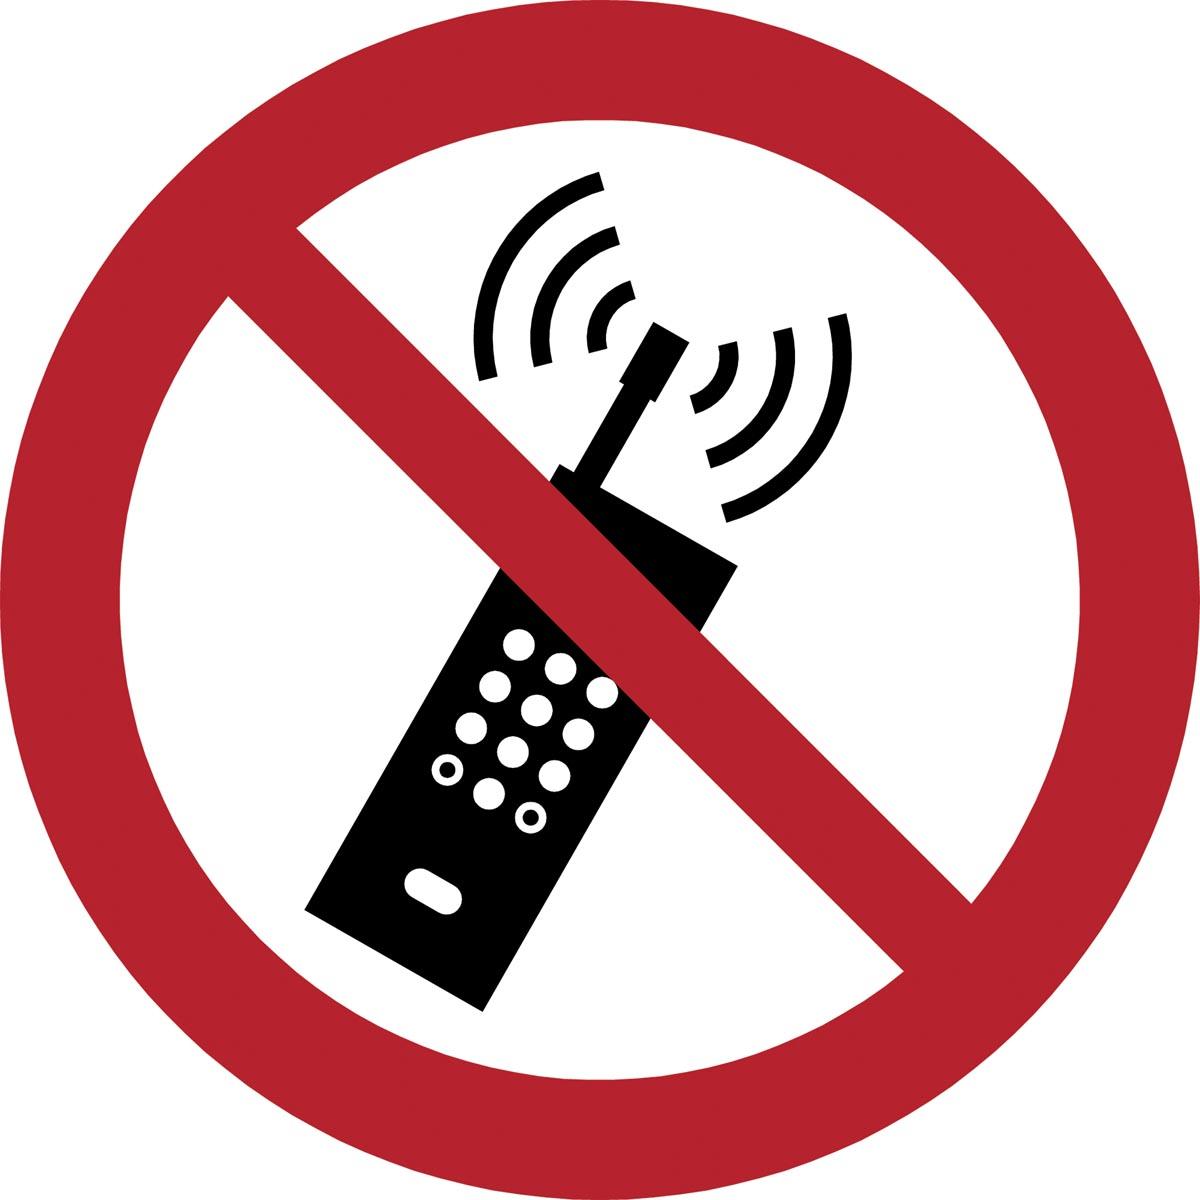 Tarifold verbodsbord uit PP, mobiele telefoon verboden, diameter 20 cm